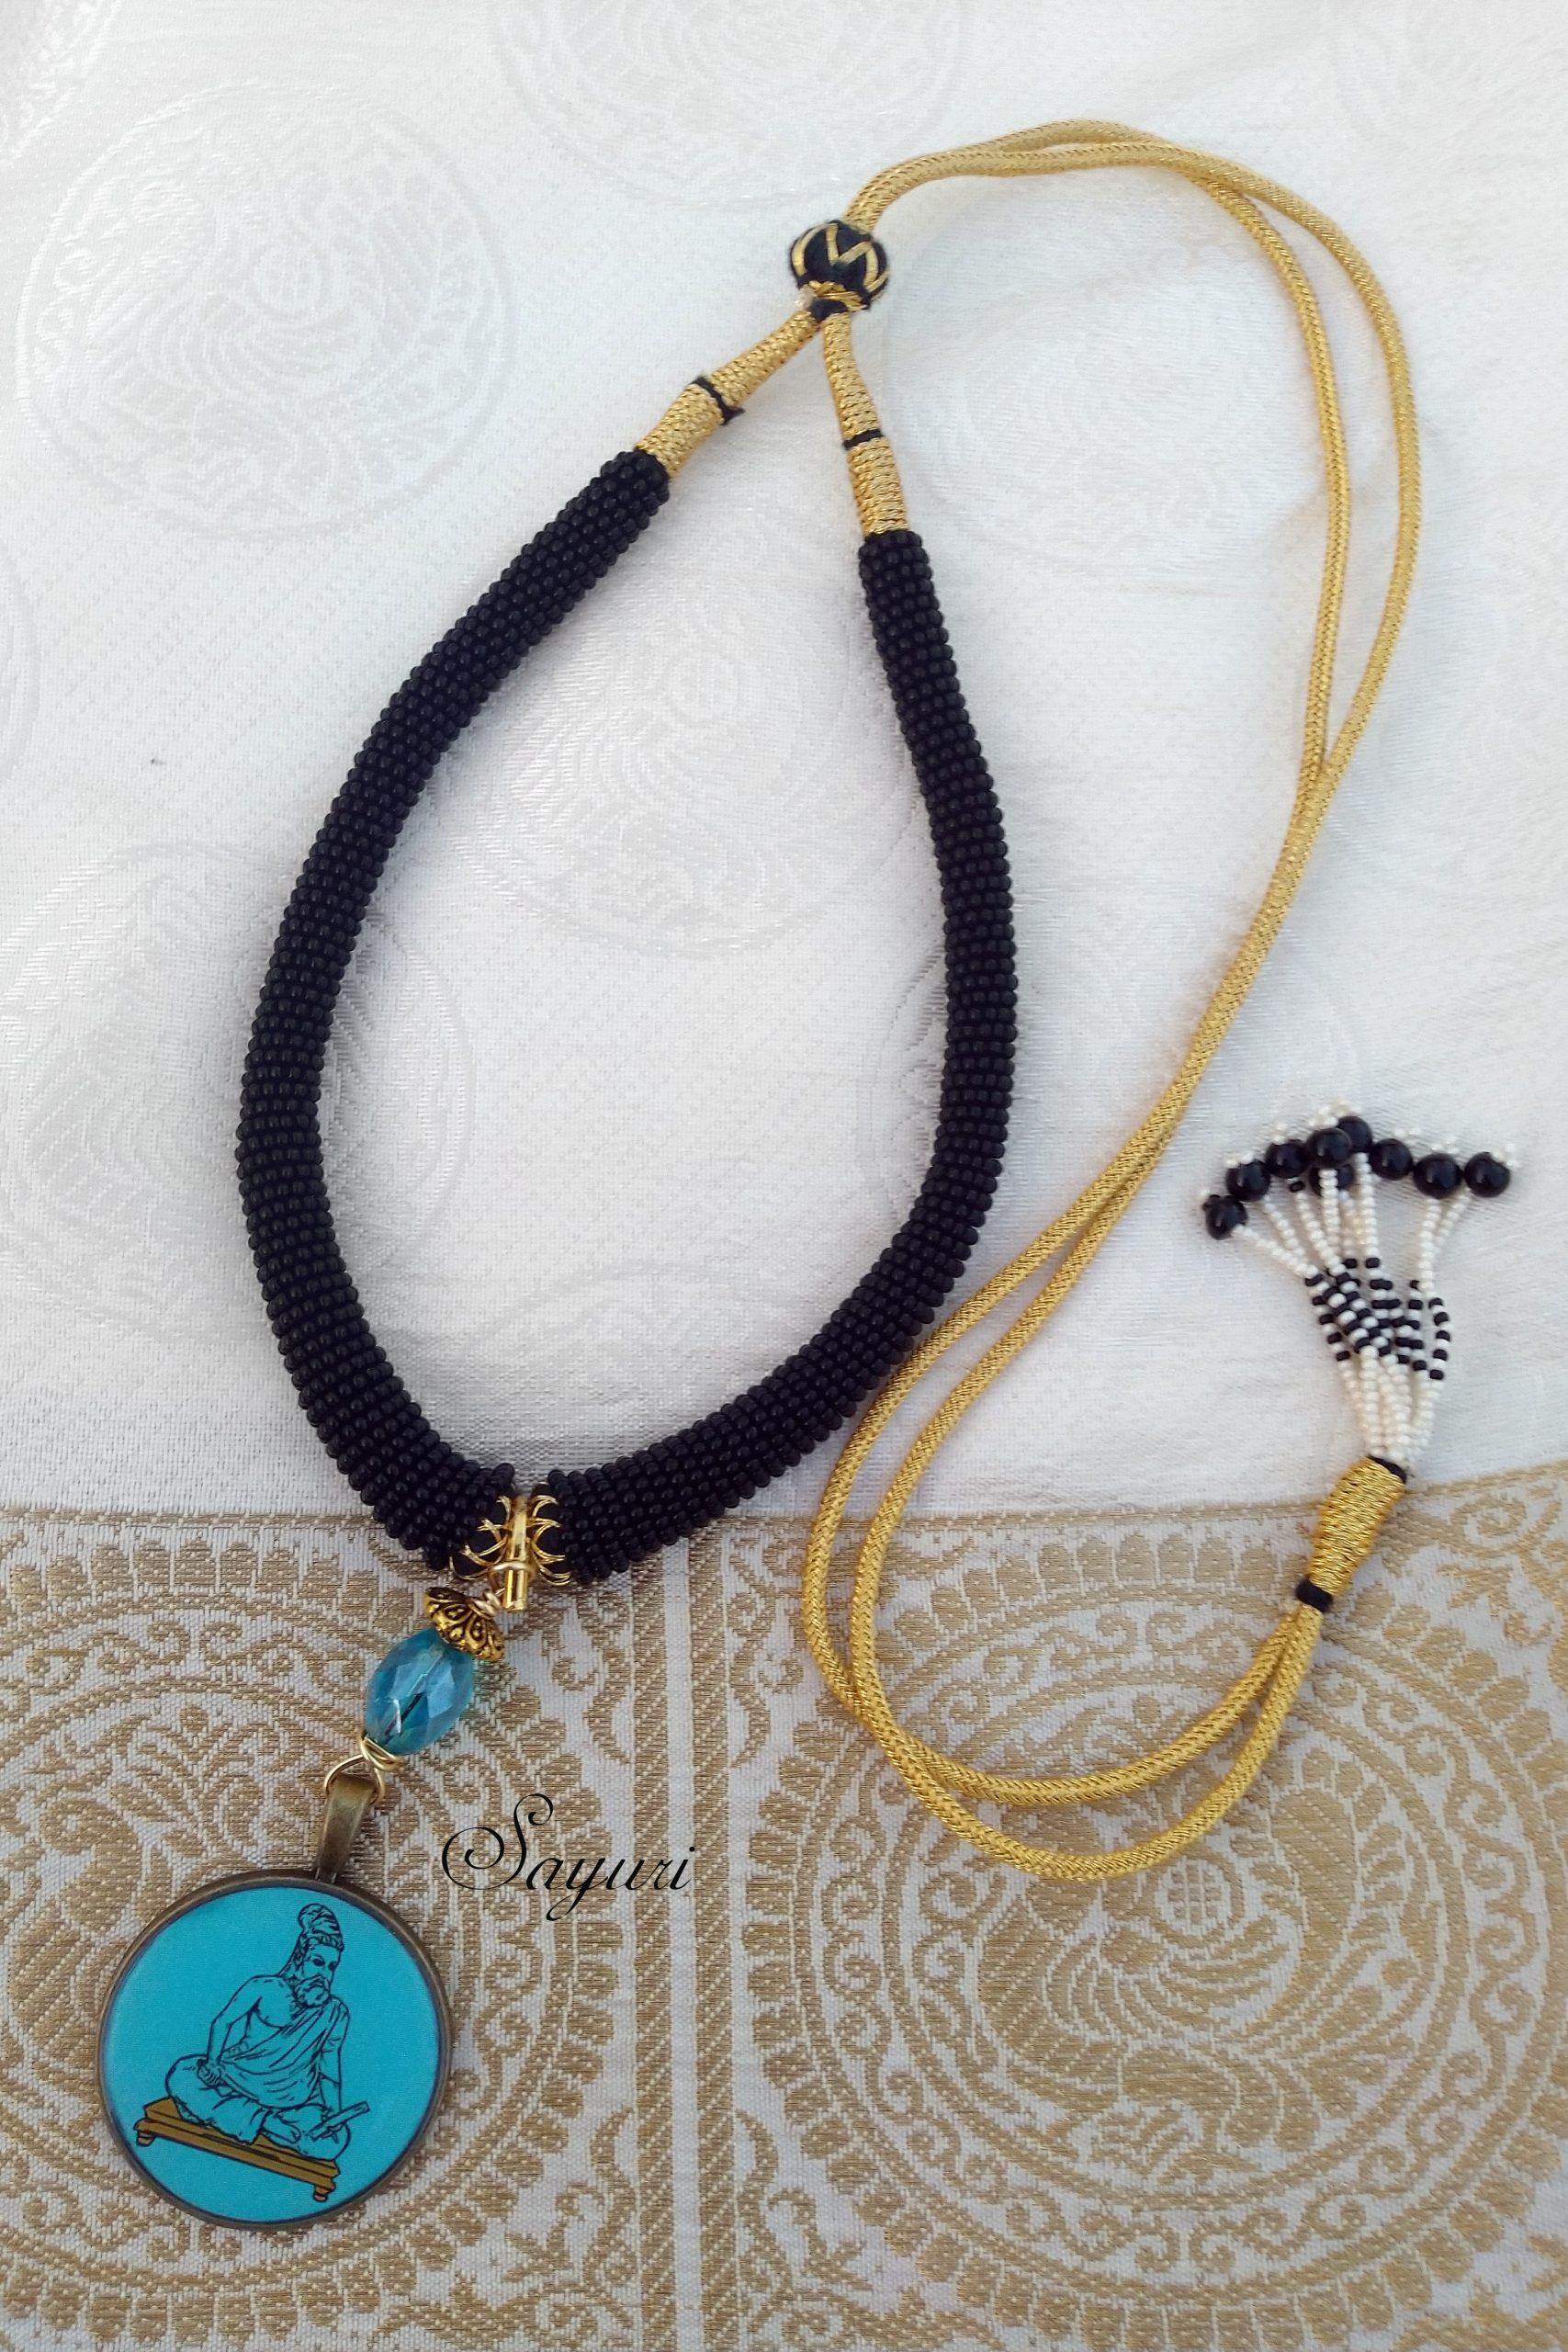 thiruvalluvar necklace